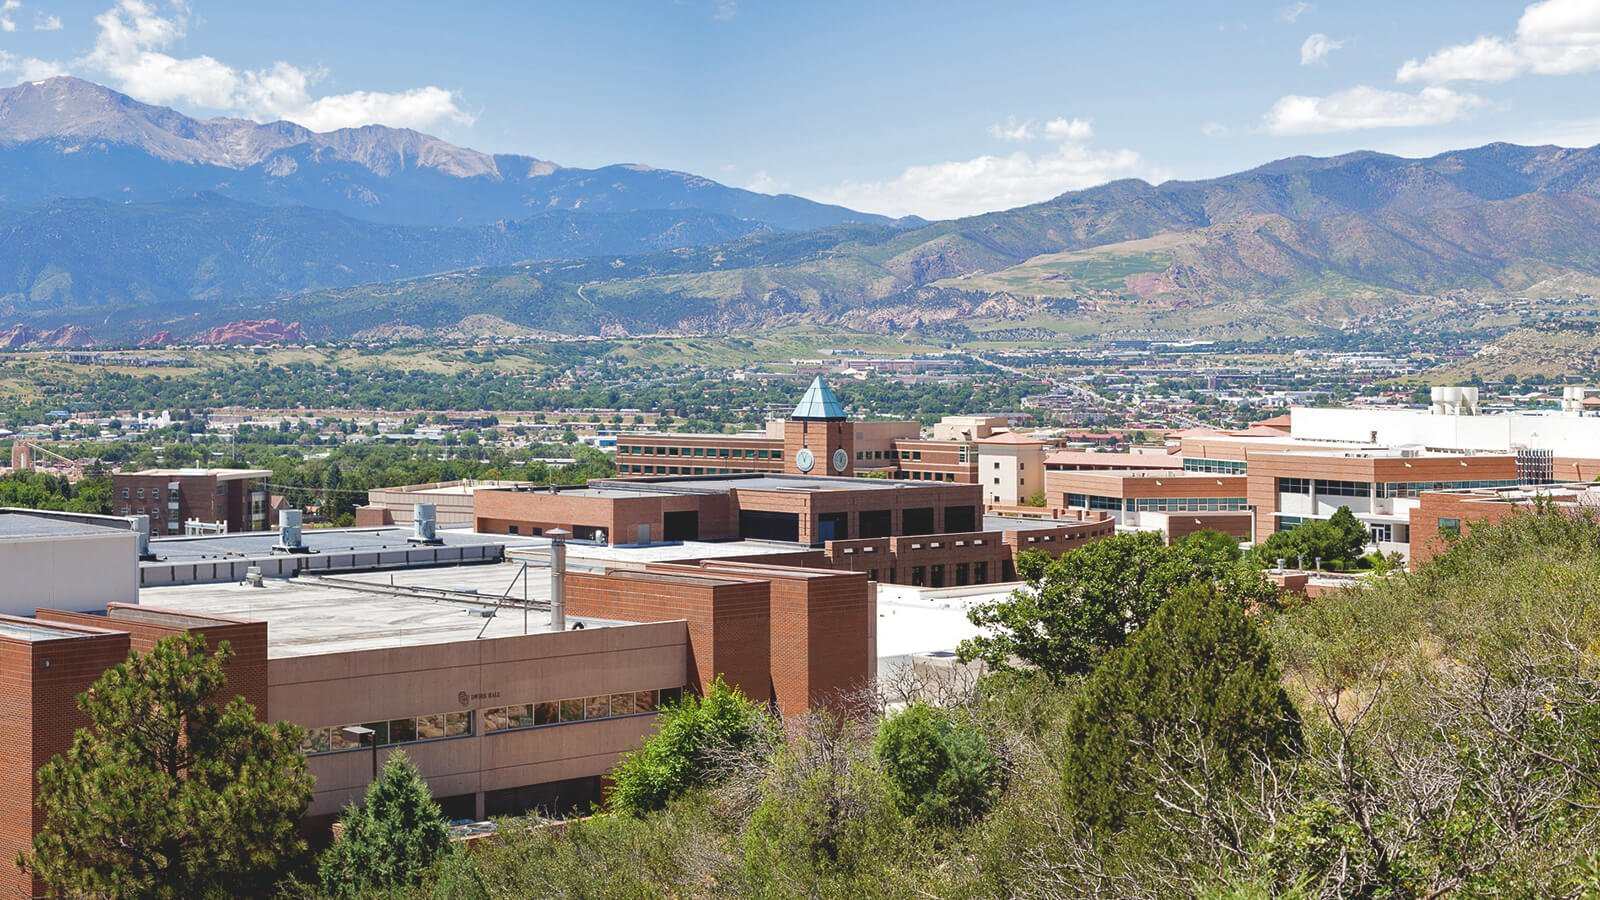 Math Courses at the University of Colorado Colorado Springs